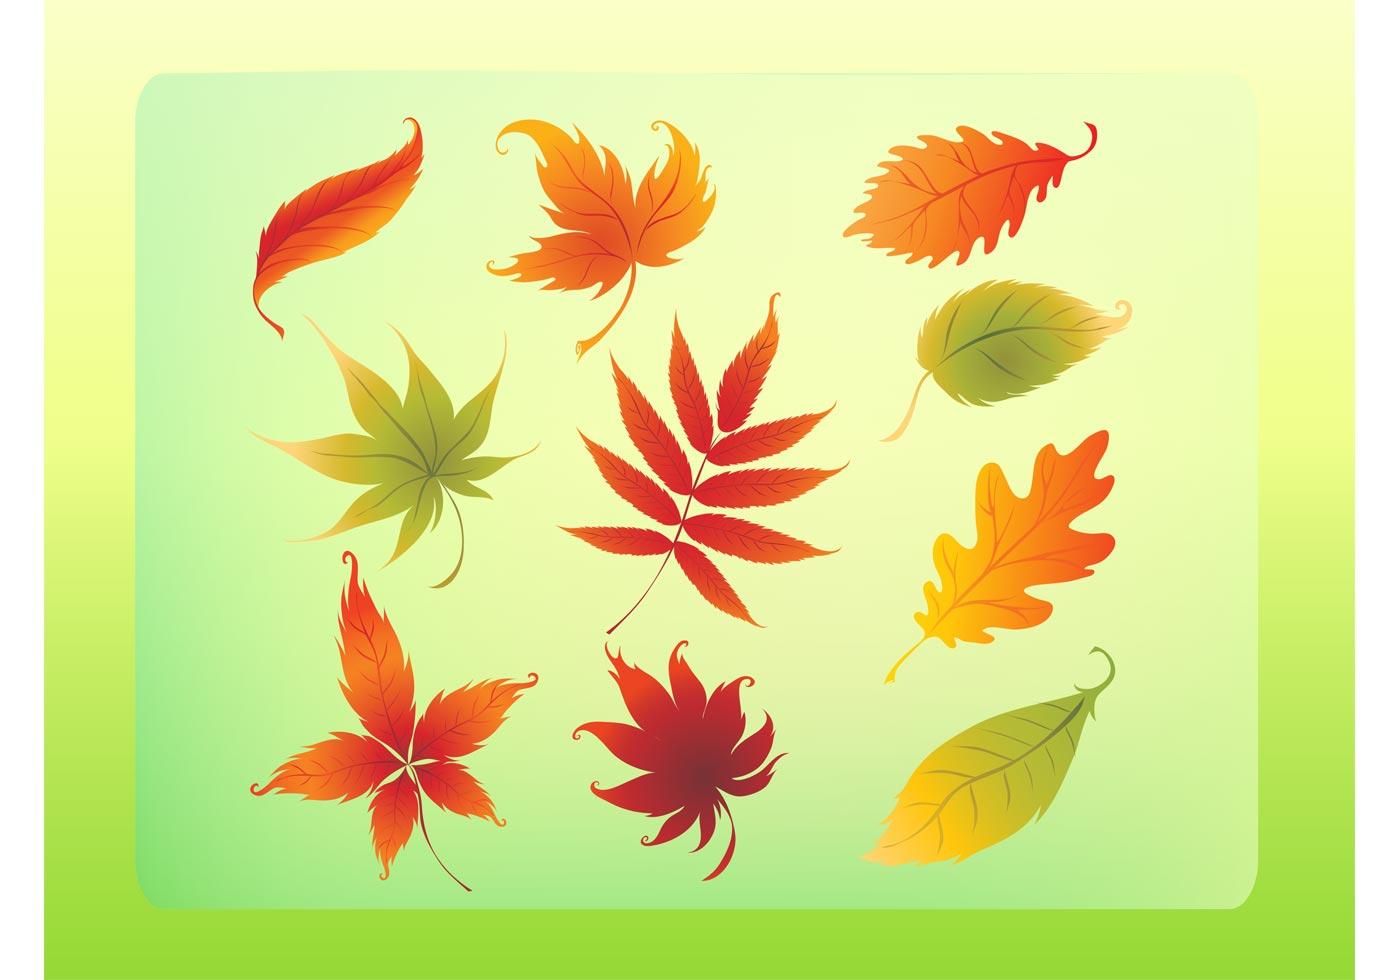 Autumn Leaves Vector Set Download Free Vector Art Stock